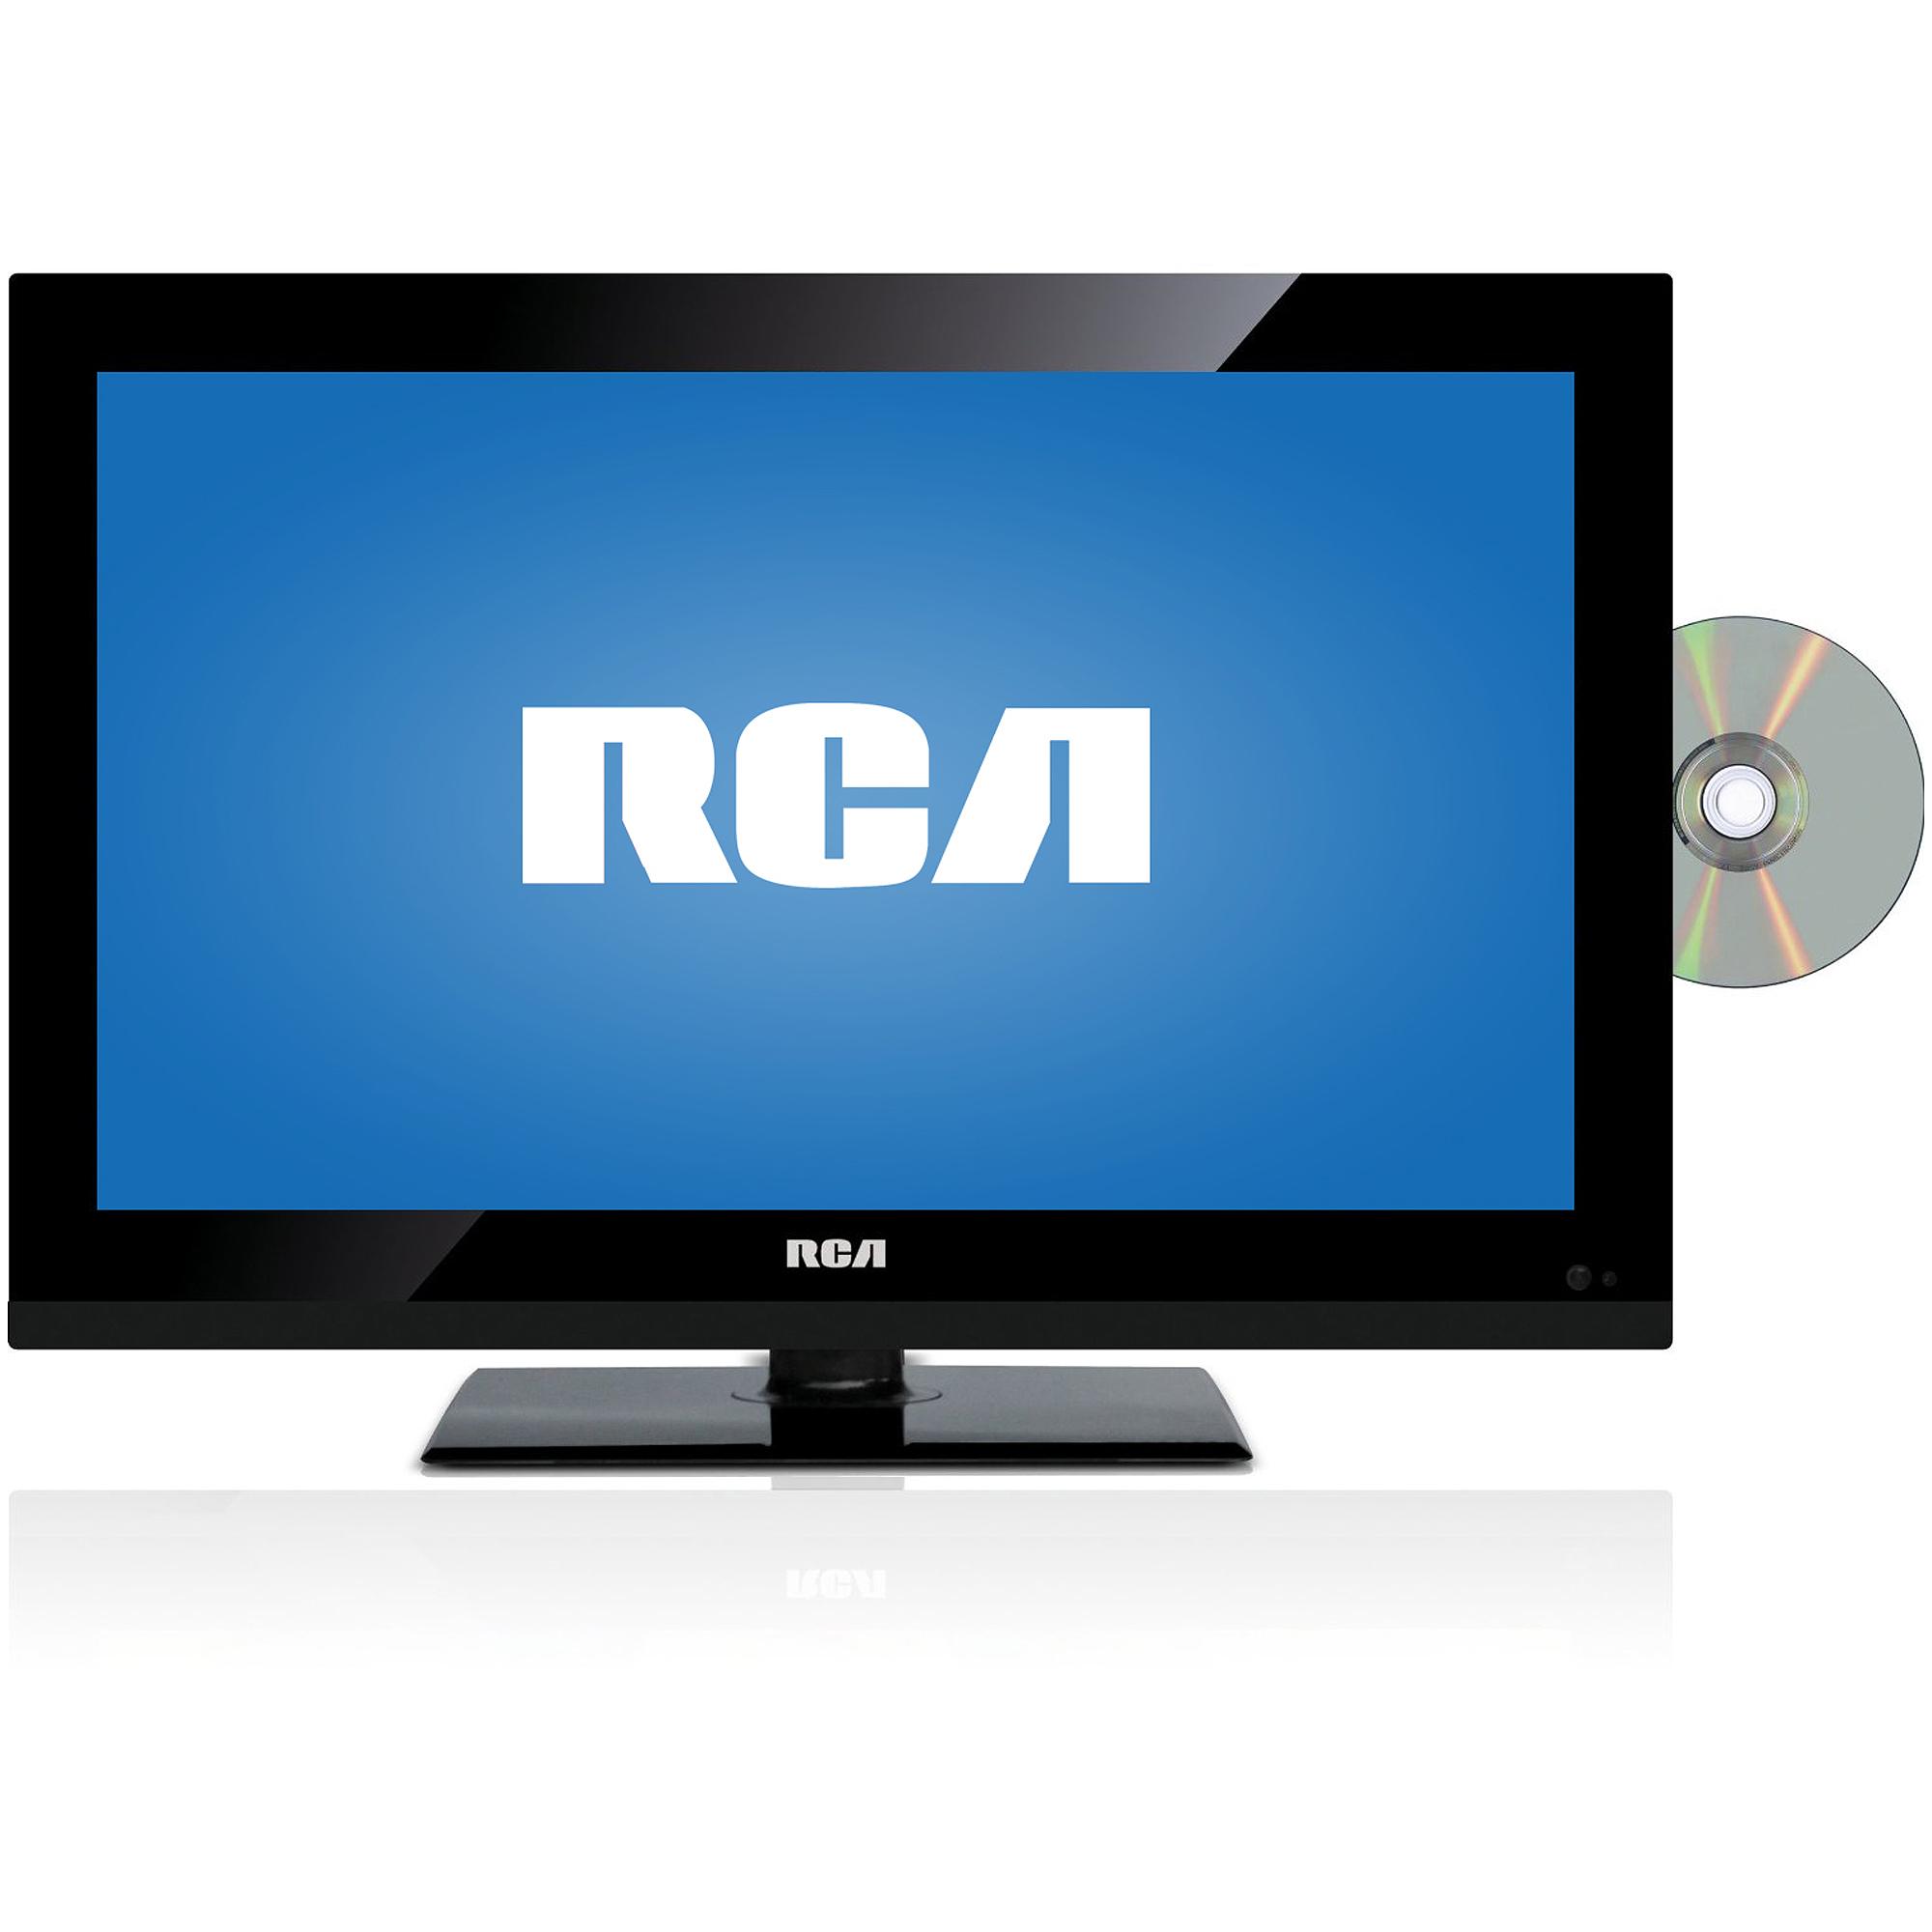 "RCA DECK185R 19"" 720p 60Hz Class LED HDTV/DVD Combo, Refurbished"